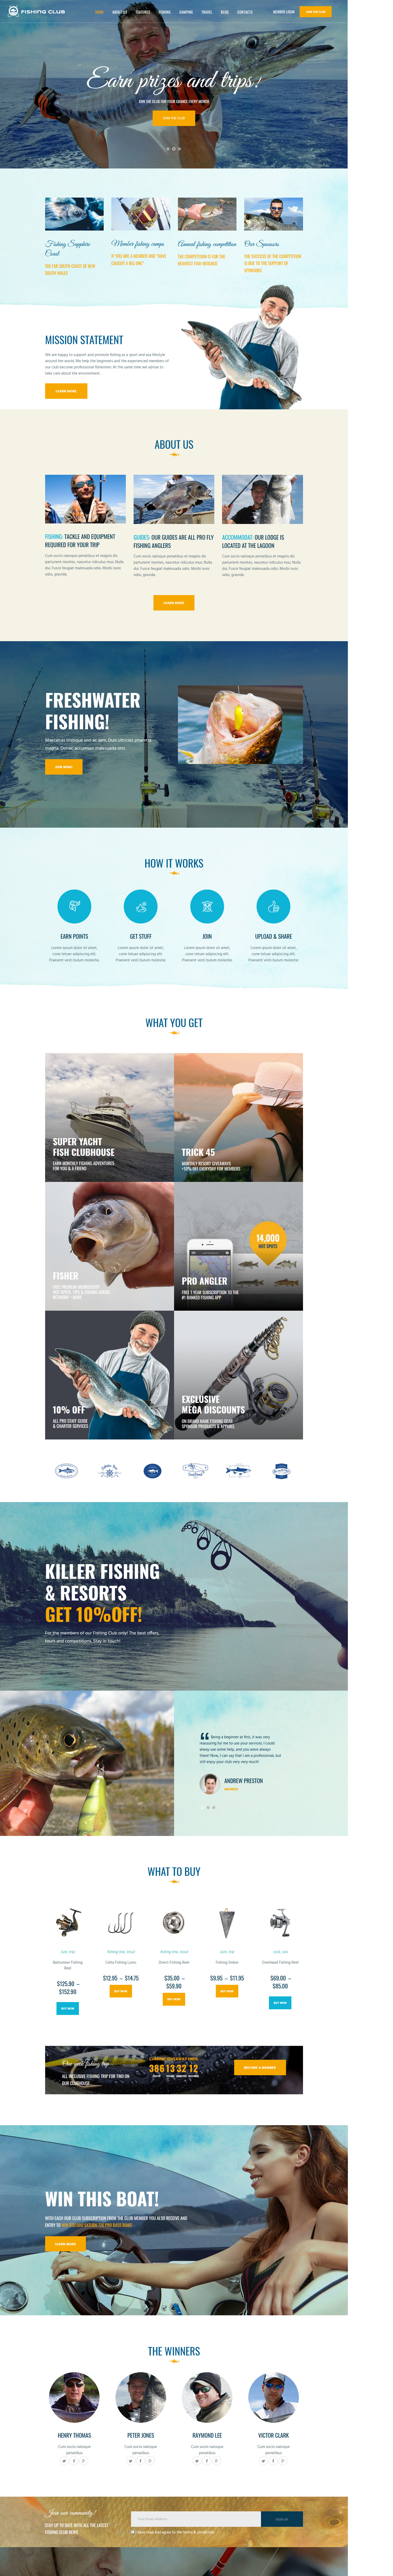 Fishing Club - Best Premium Outdoor Activities WordPress Theme